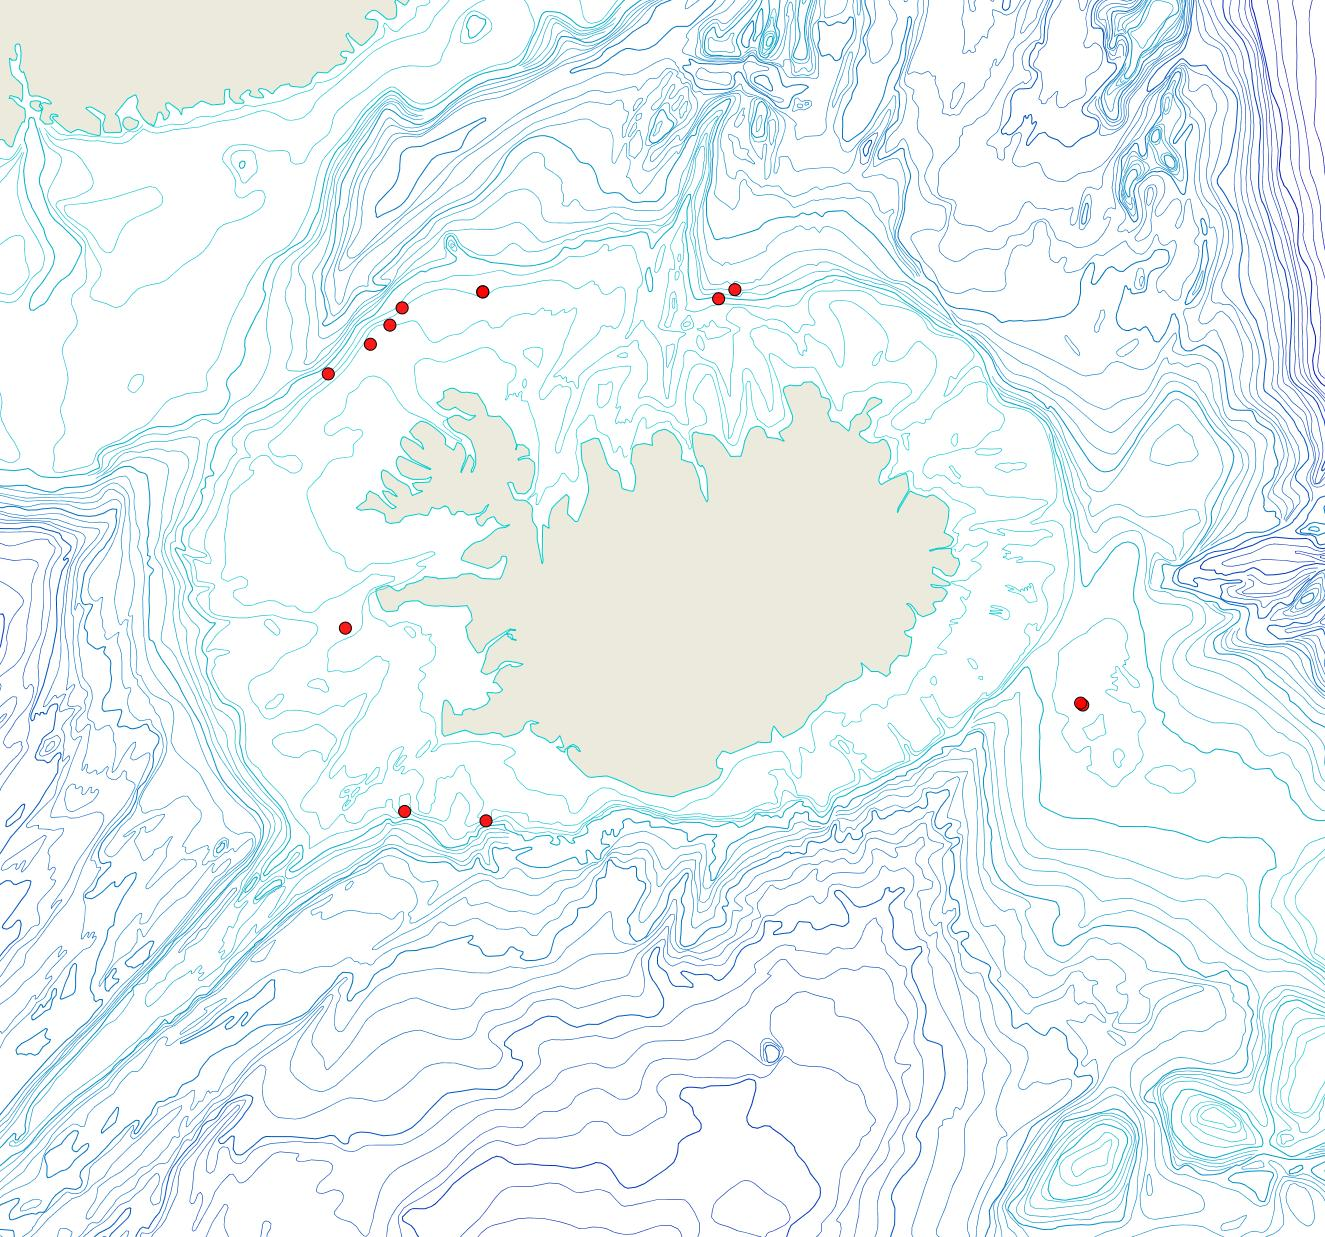 Útbreiðsla Notoplites harmeri(Bioice samples, red dots)